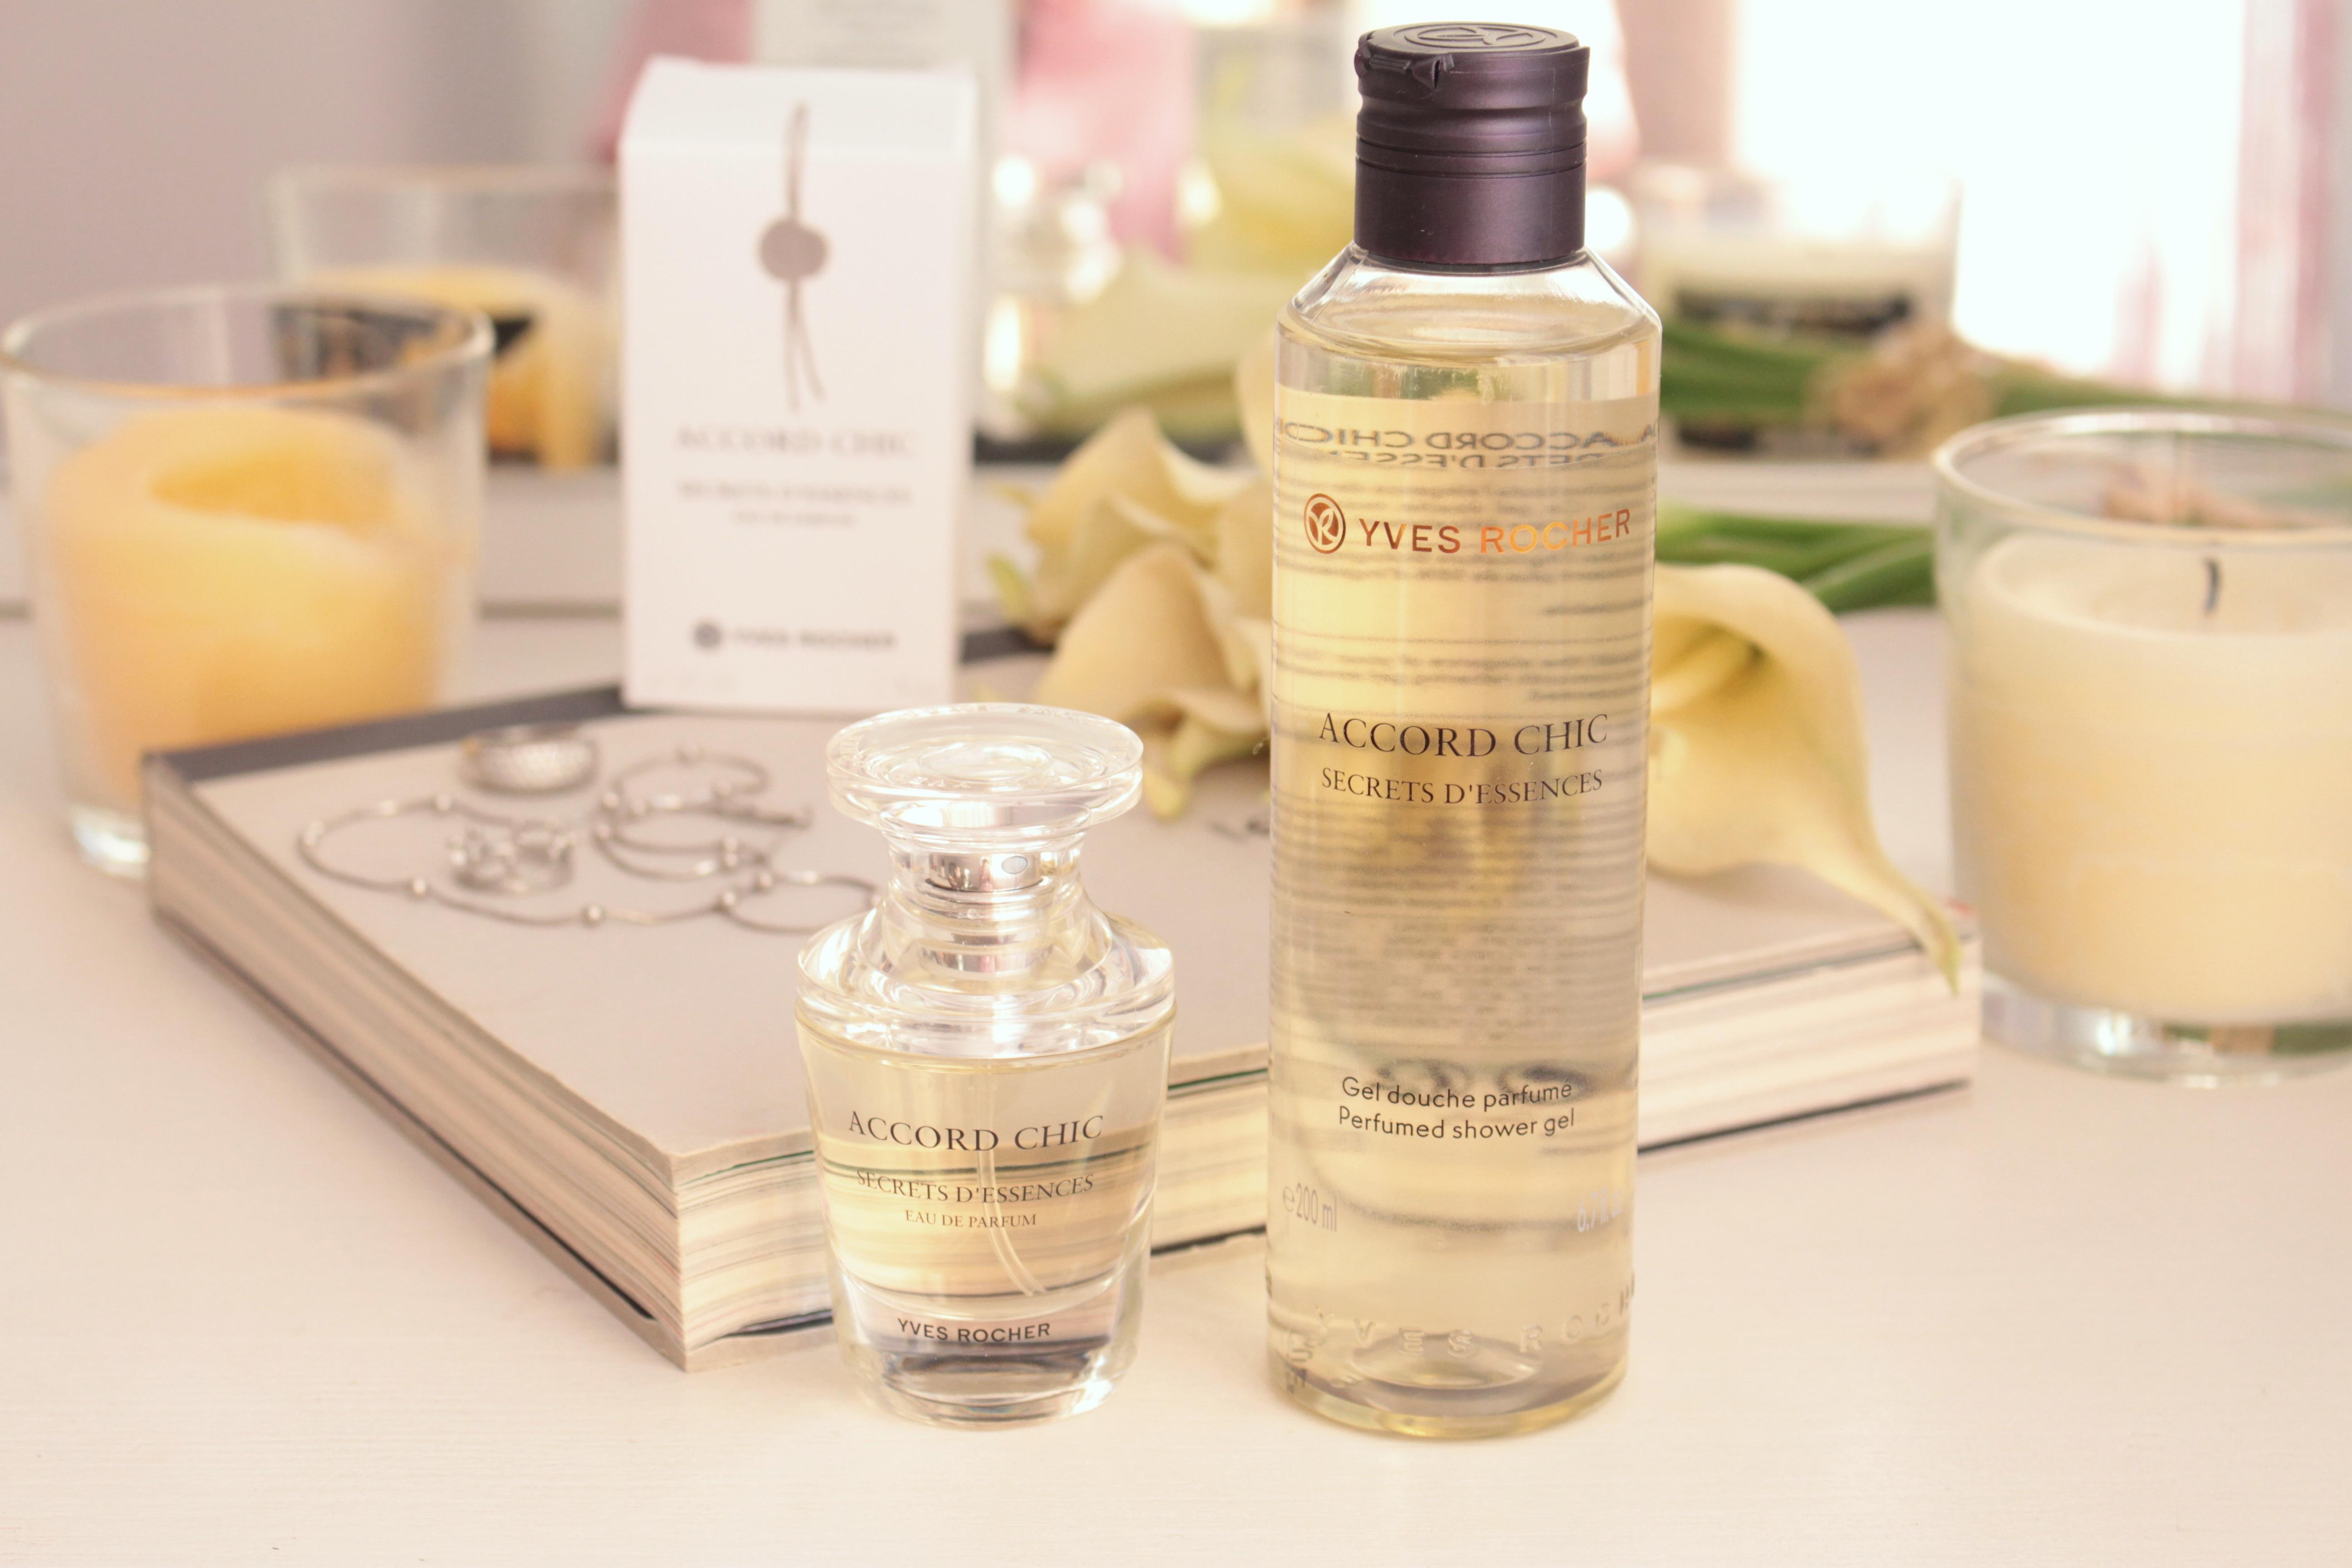 Yves Rocher Secrets D'essences Accord Chic Eau De Parfum & Perfumed Shower Gel Парфюмерная вода и Парфюмированный гель для душа